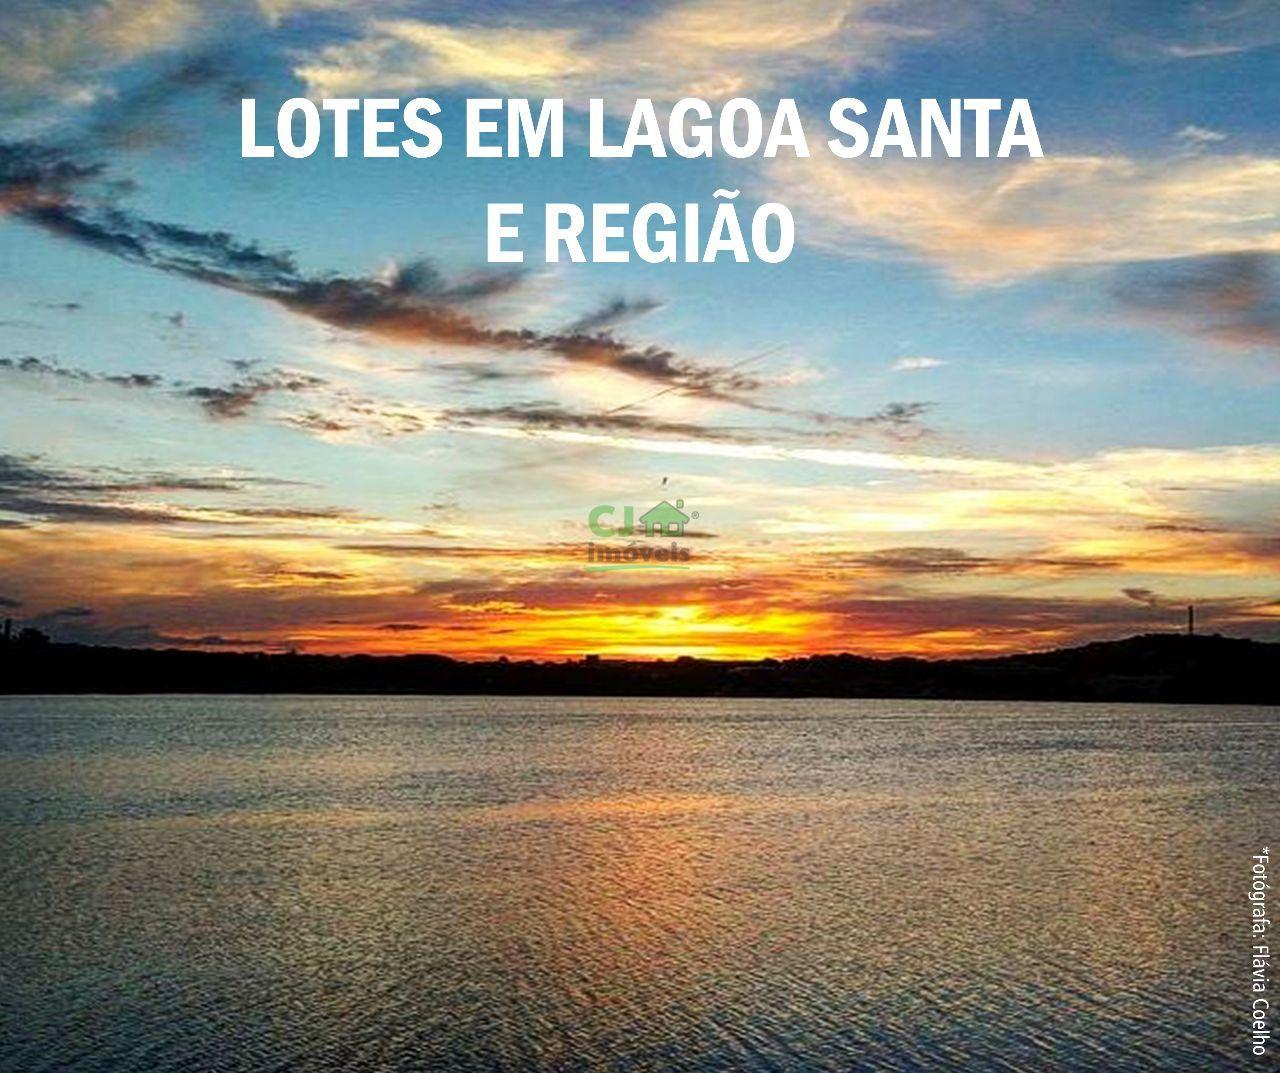 Lotes em Condomínio - Condomínio Parque Dos Buritis - Lagoa Santa